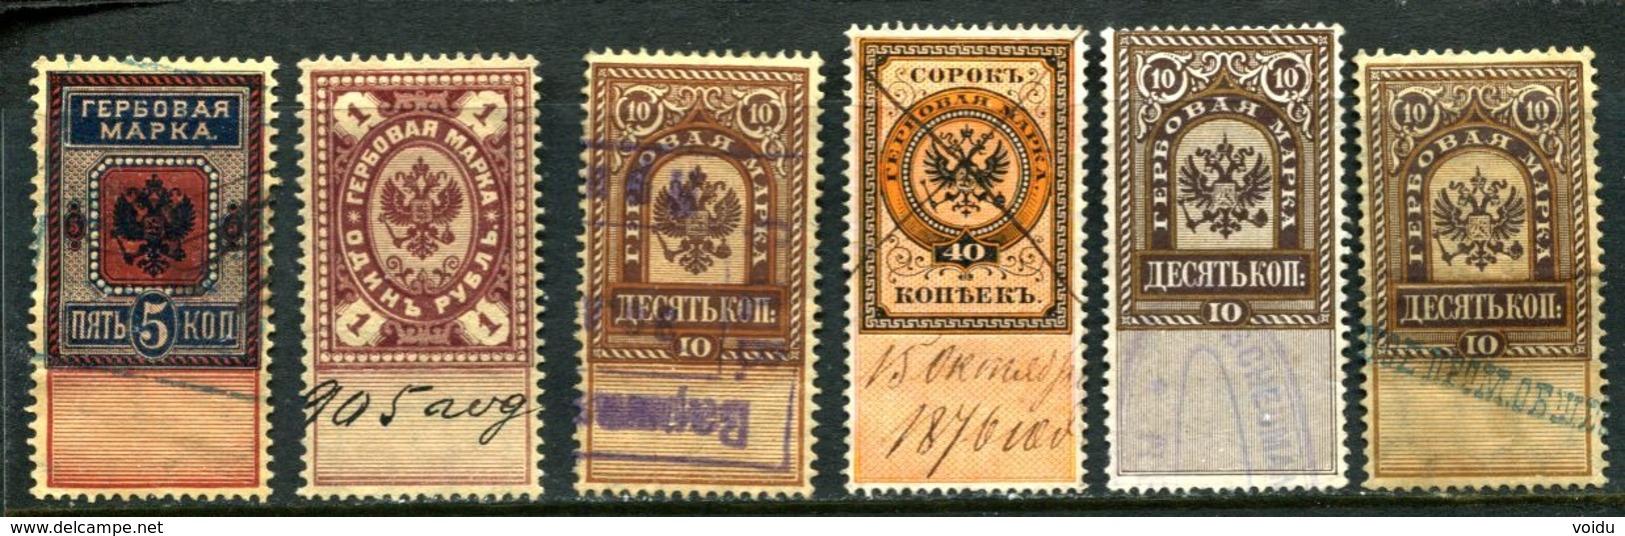 Russia  1918 Revenue Used - Revenue Stamps